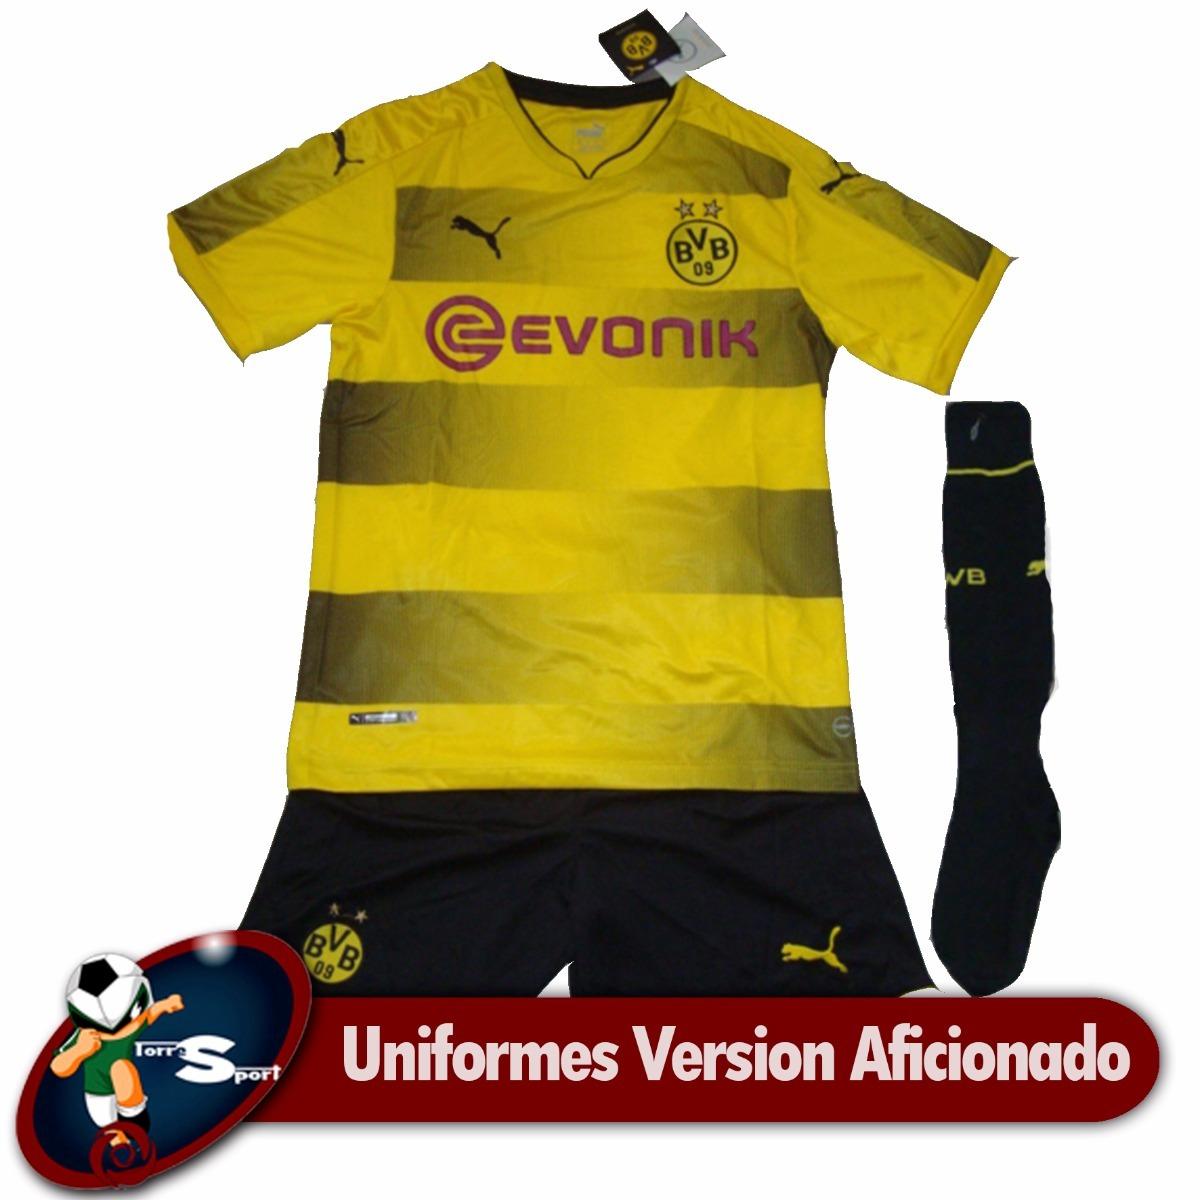 Uniformes De Futbol Originales Marca Puma Clubes 2017 -   499.00 en ... 68399edded19d